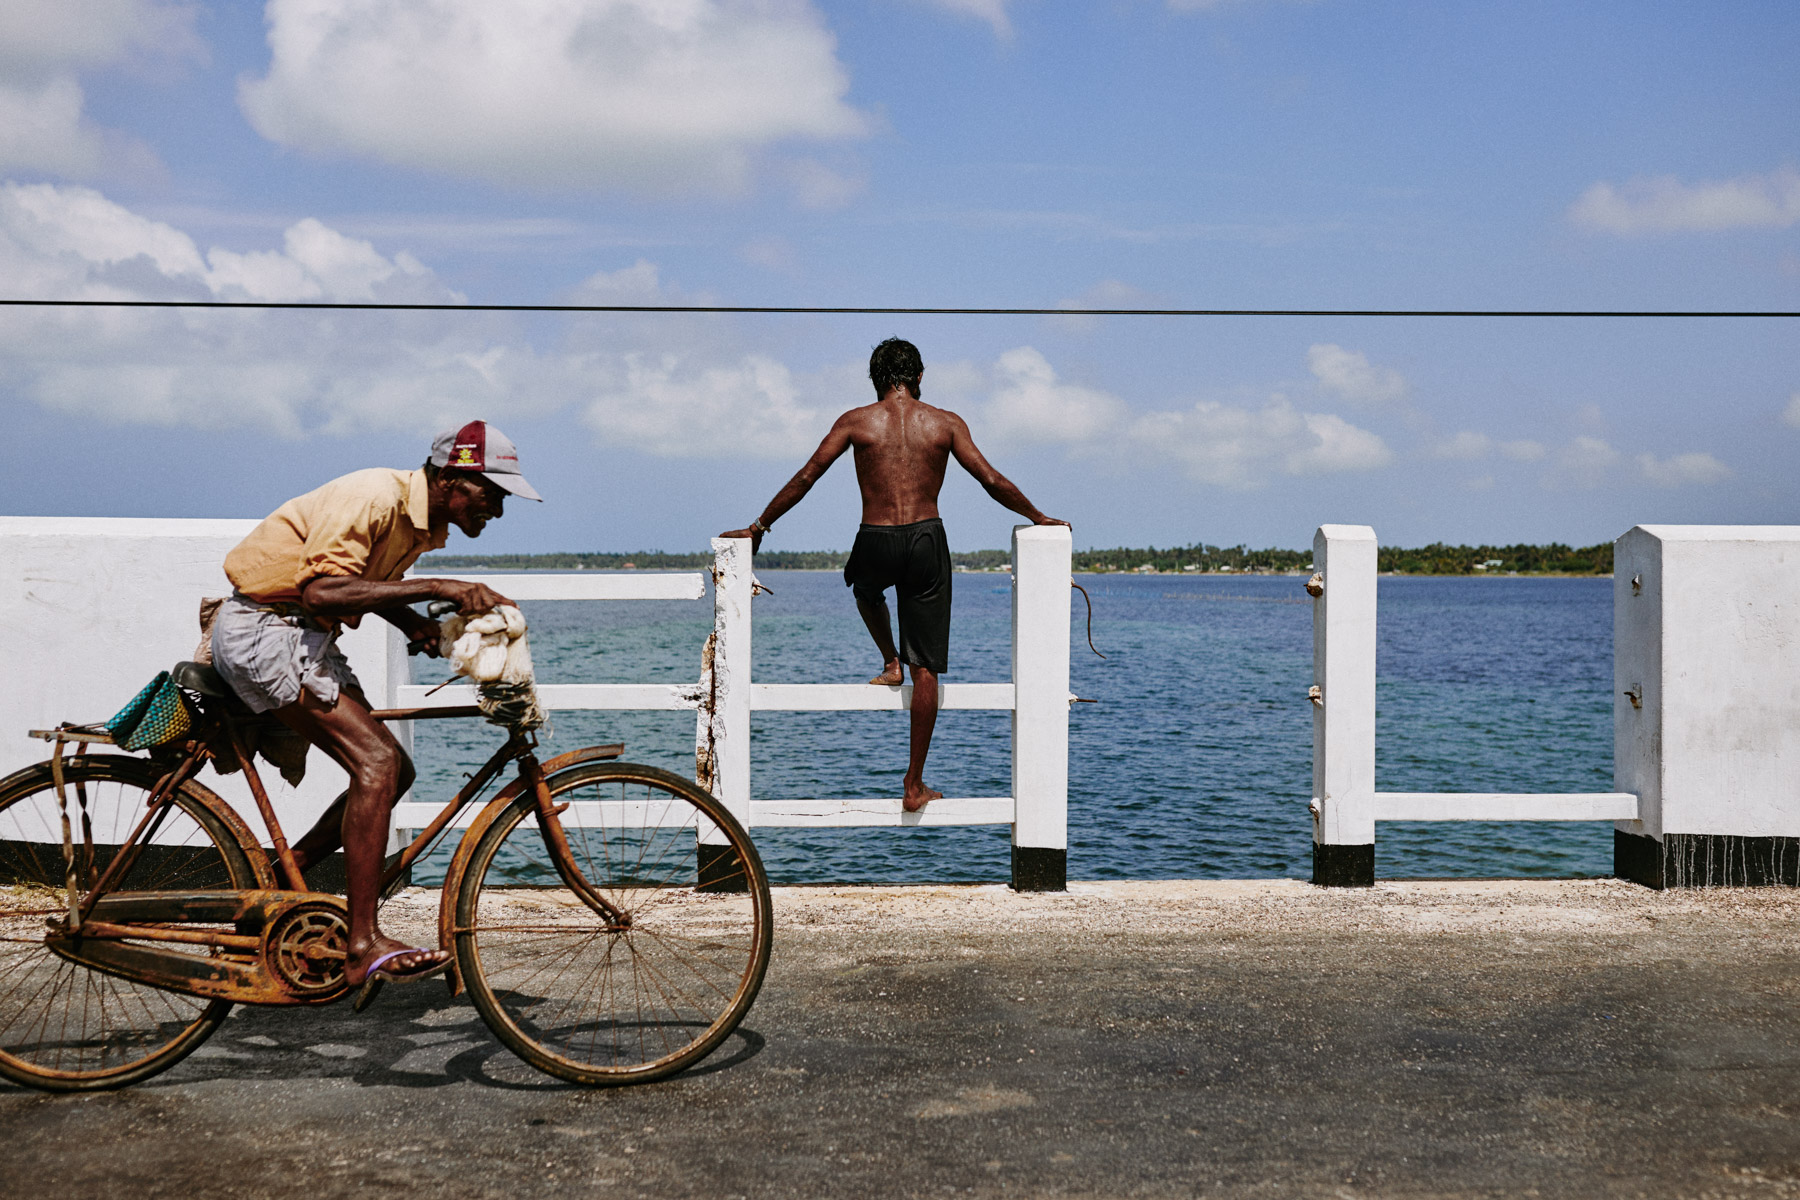 A fisherman contemplates the sea on the Jaffna Peninsula in northern Sri Lanka.